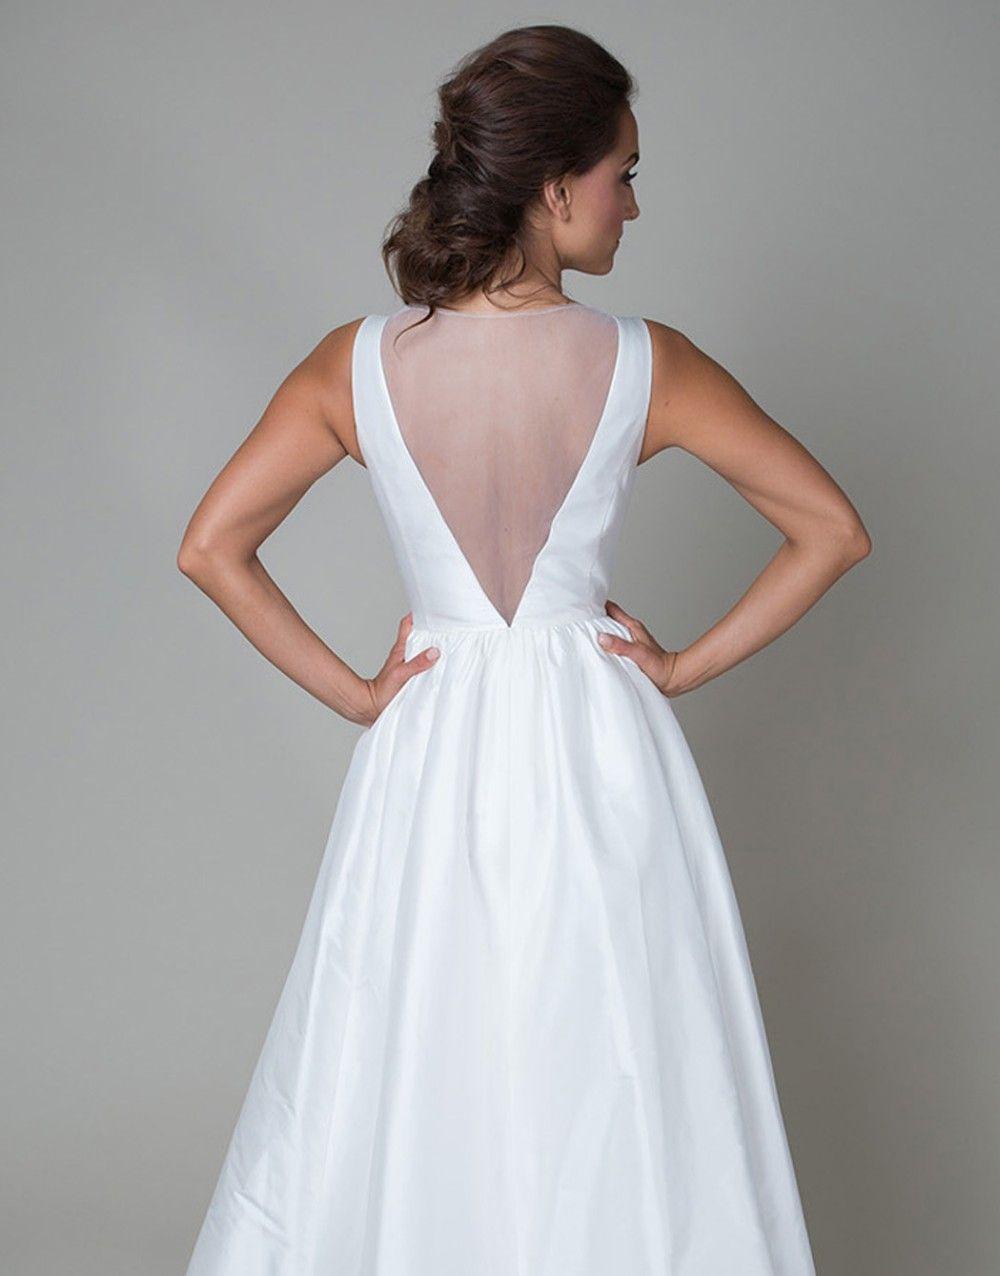 Vintage v neck see through long white boho beach wedding dress with